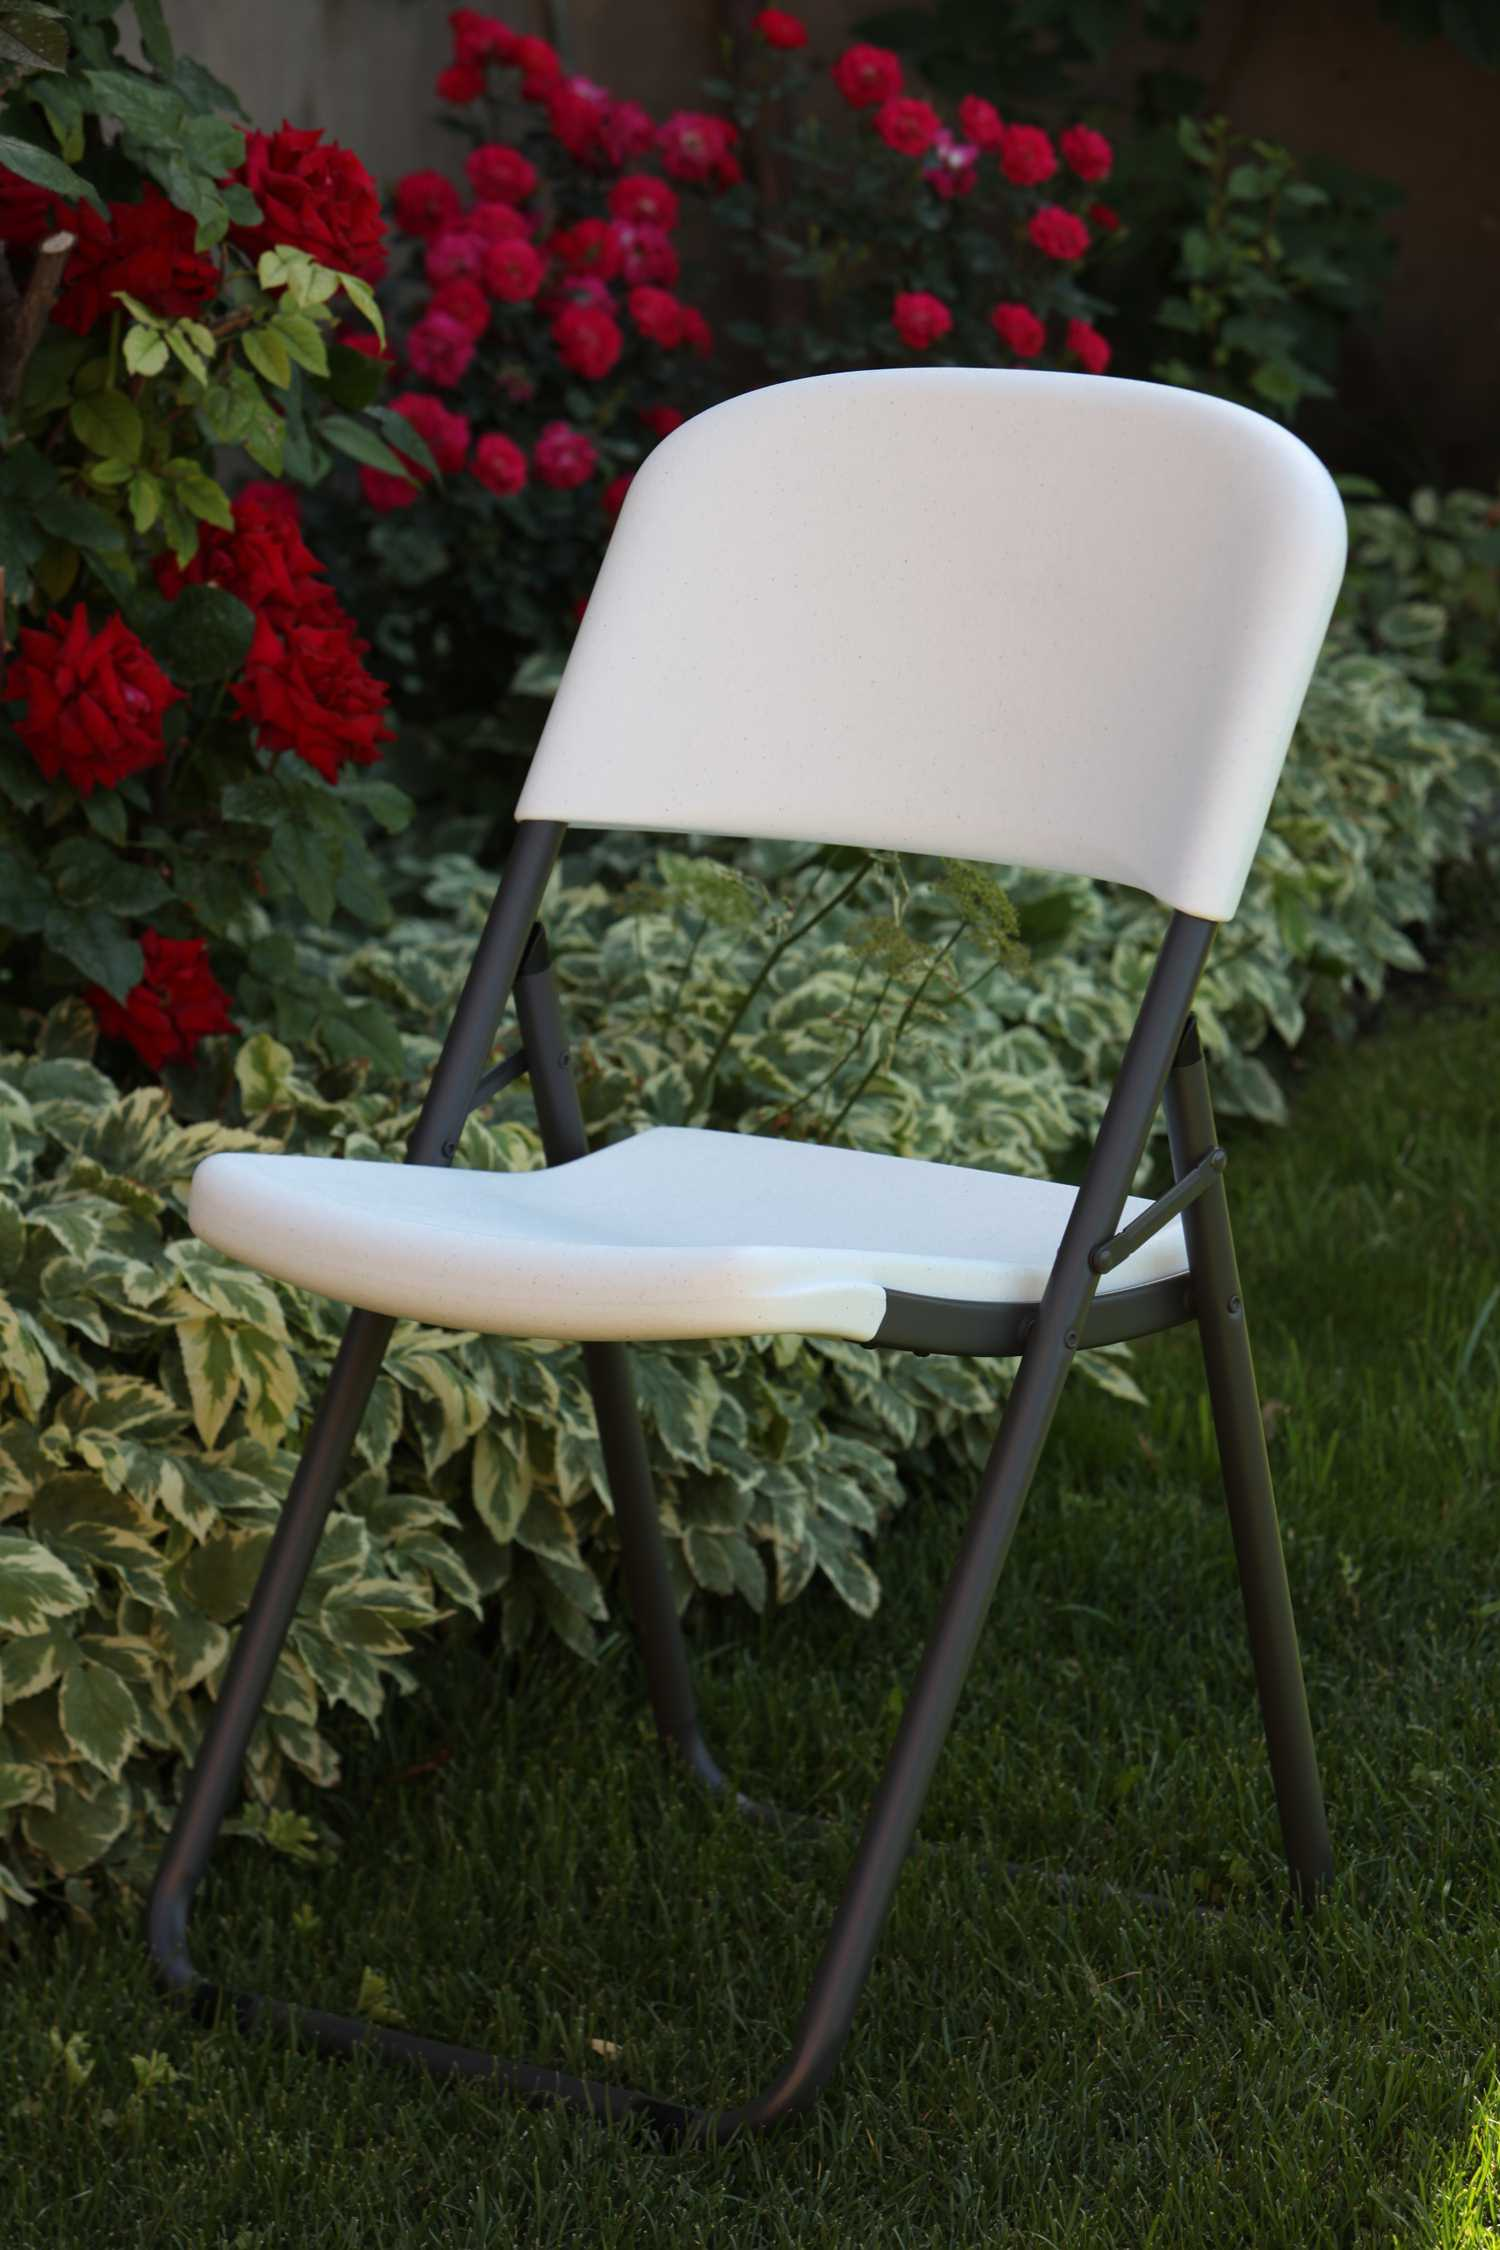 Lifetime Folding Chairs White Granite Loop Leg Chair 4 Pack